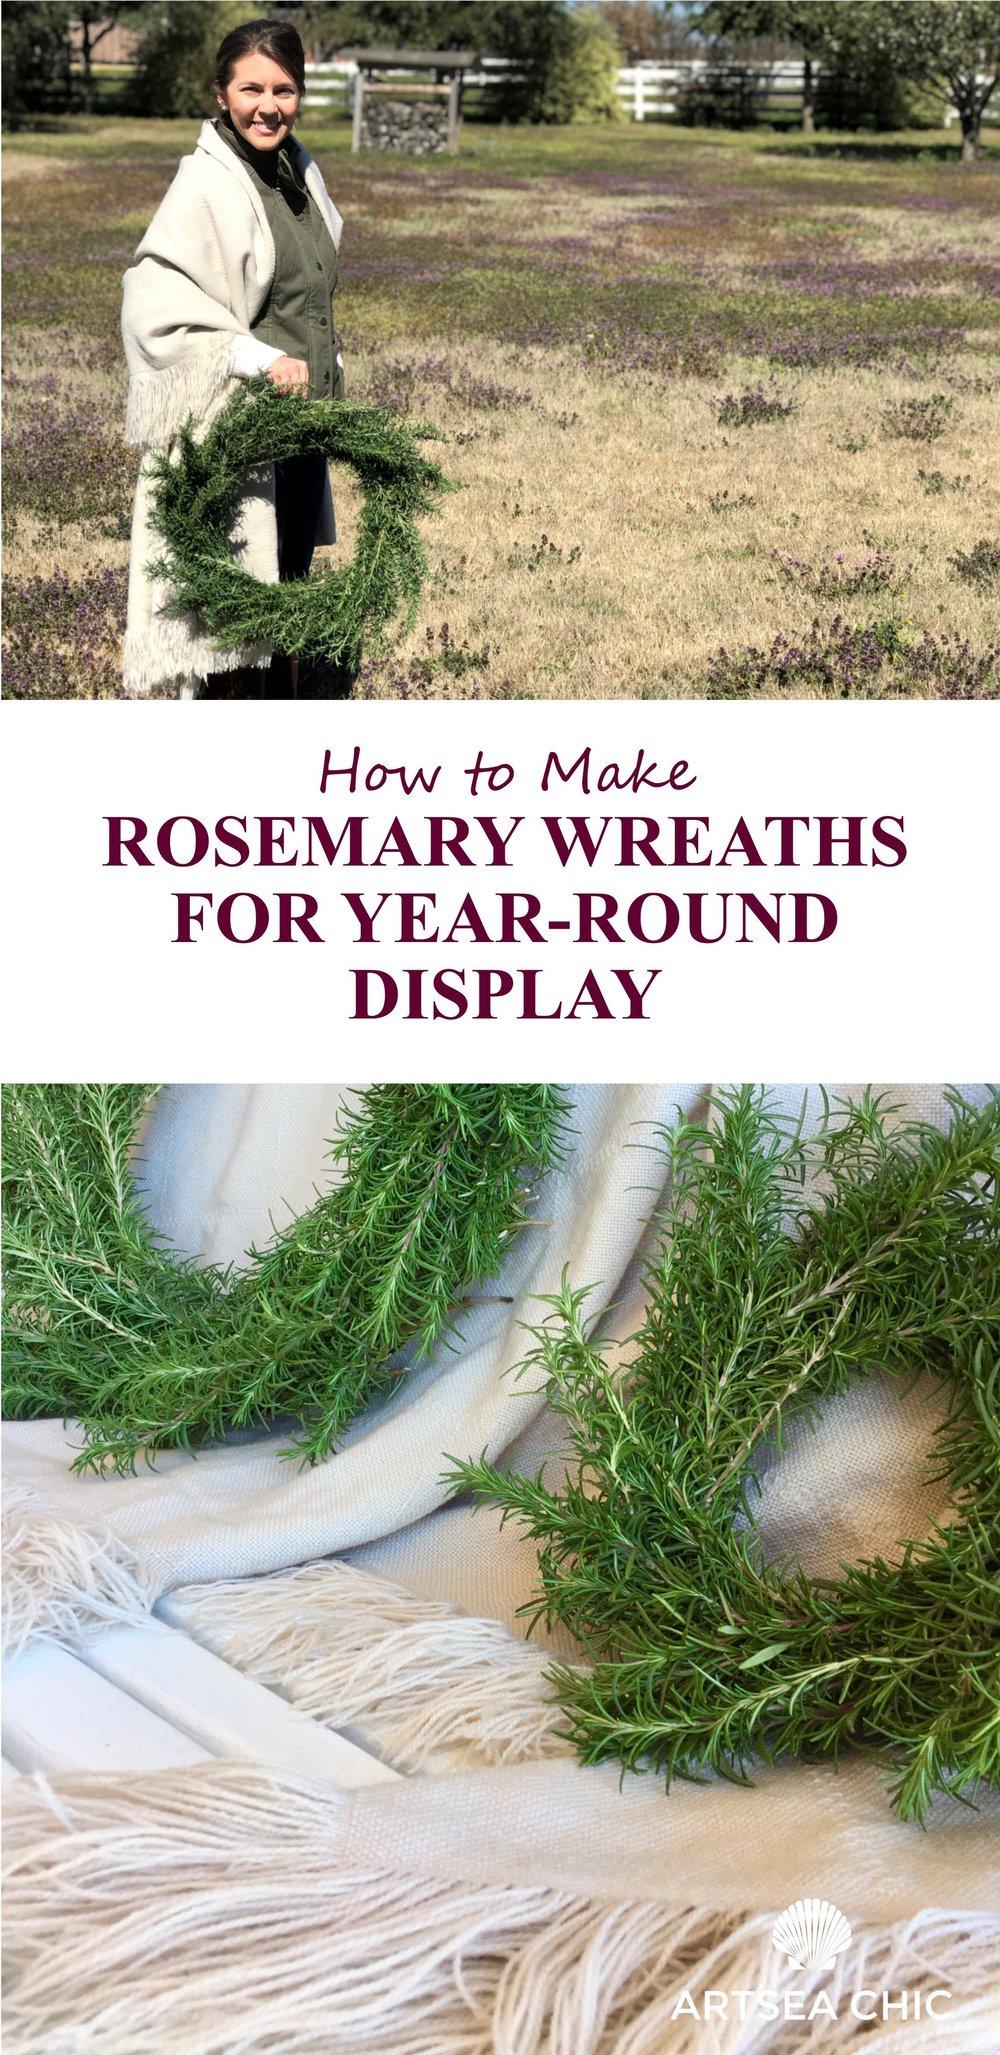 How to Make Rosemary Wreaths for Yearround Display.jpg